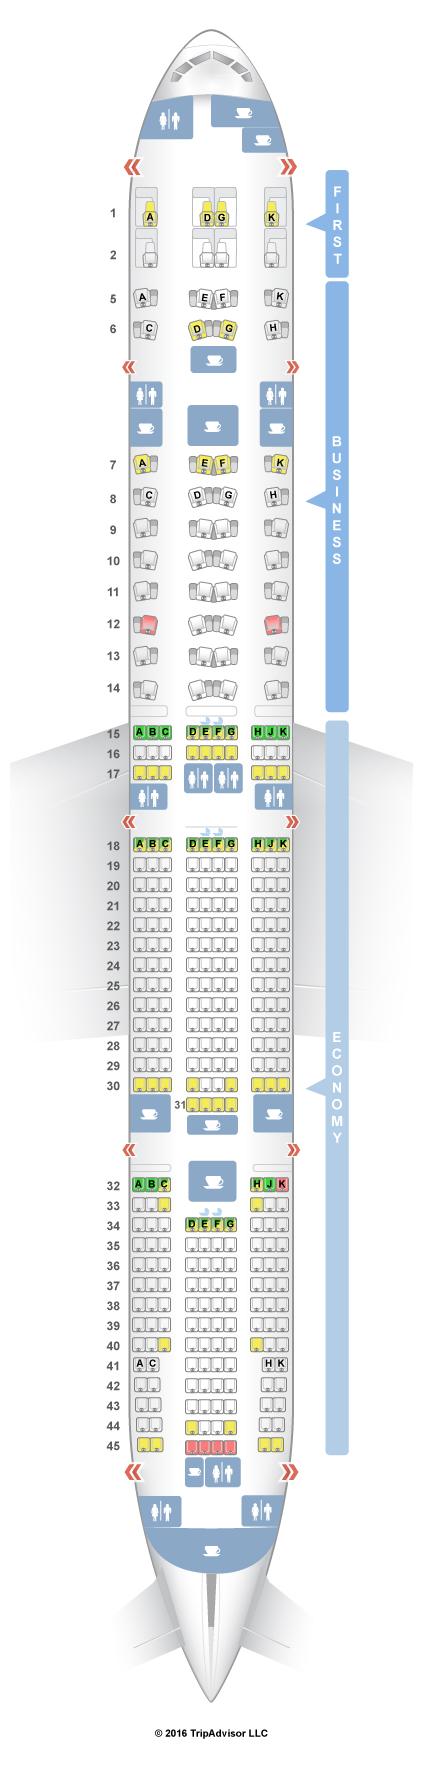 SeatGuru Seat Map Etihad Boeing 777-300ER (77W) Three Class - photo#33